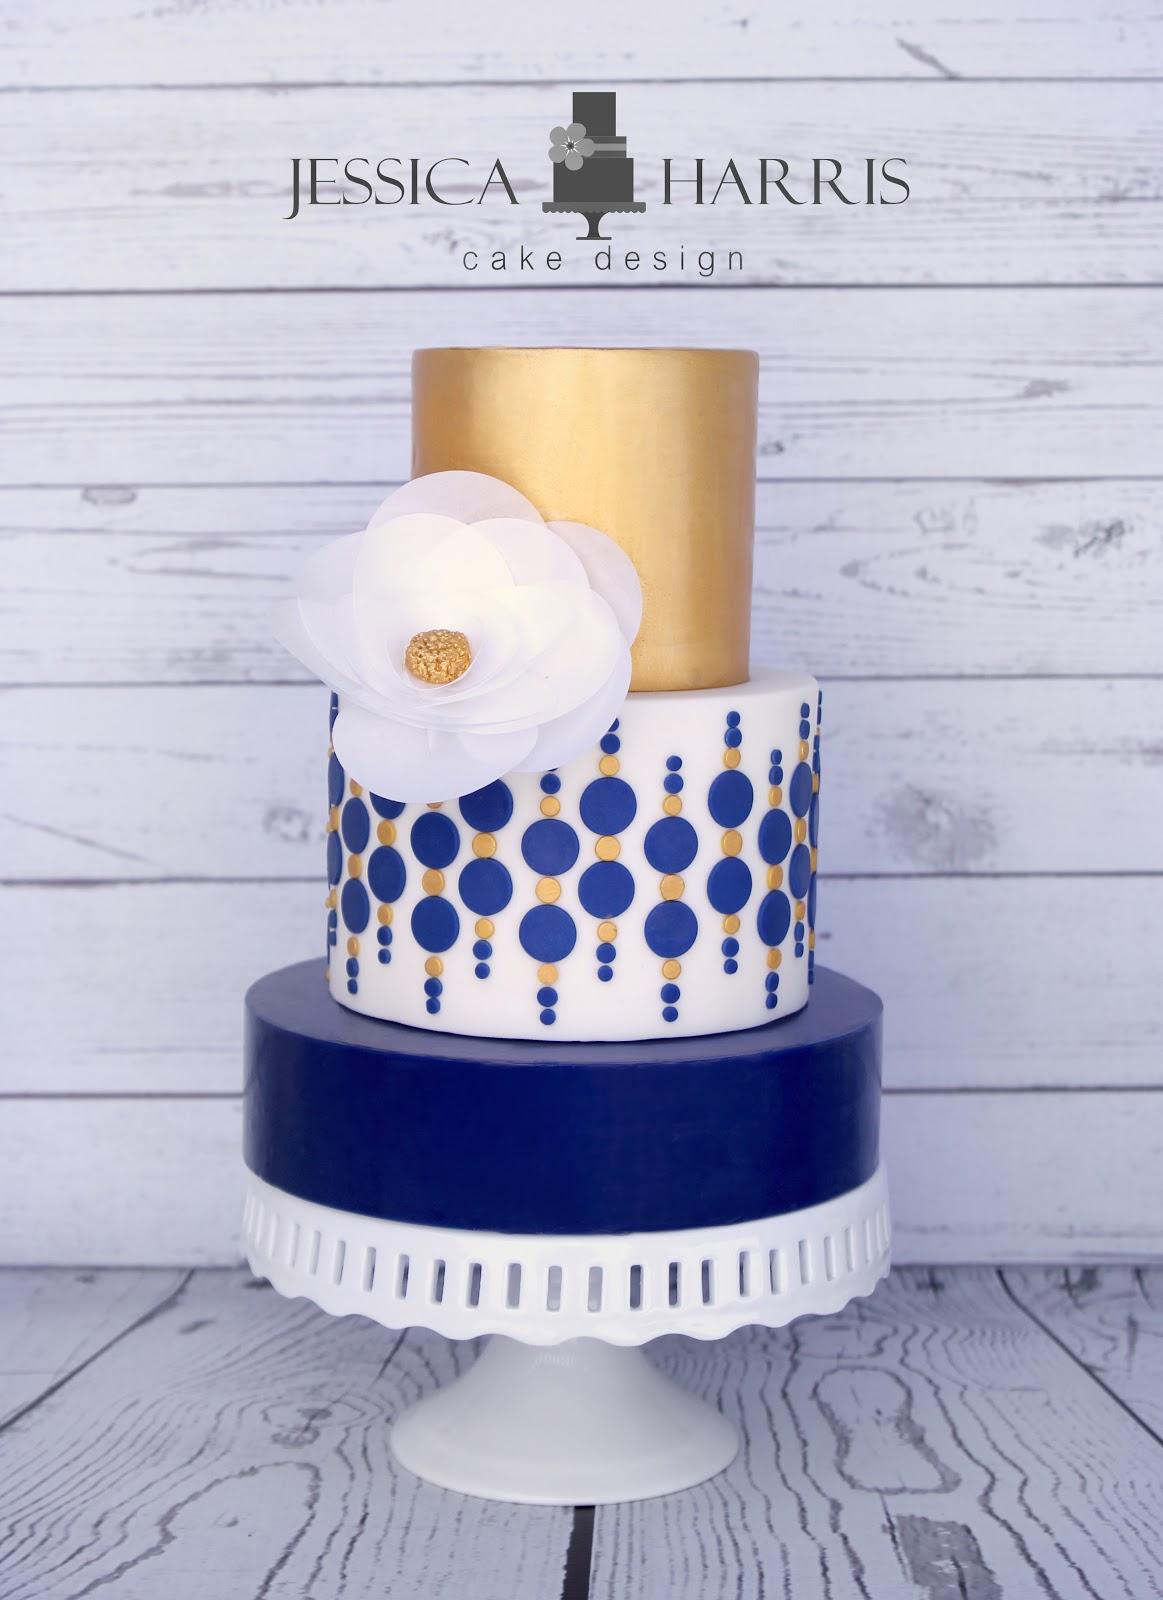 20 New Cake Design Ideas